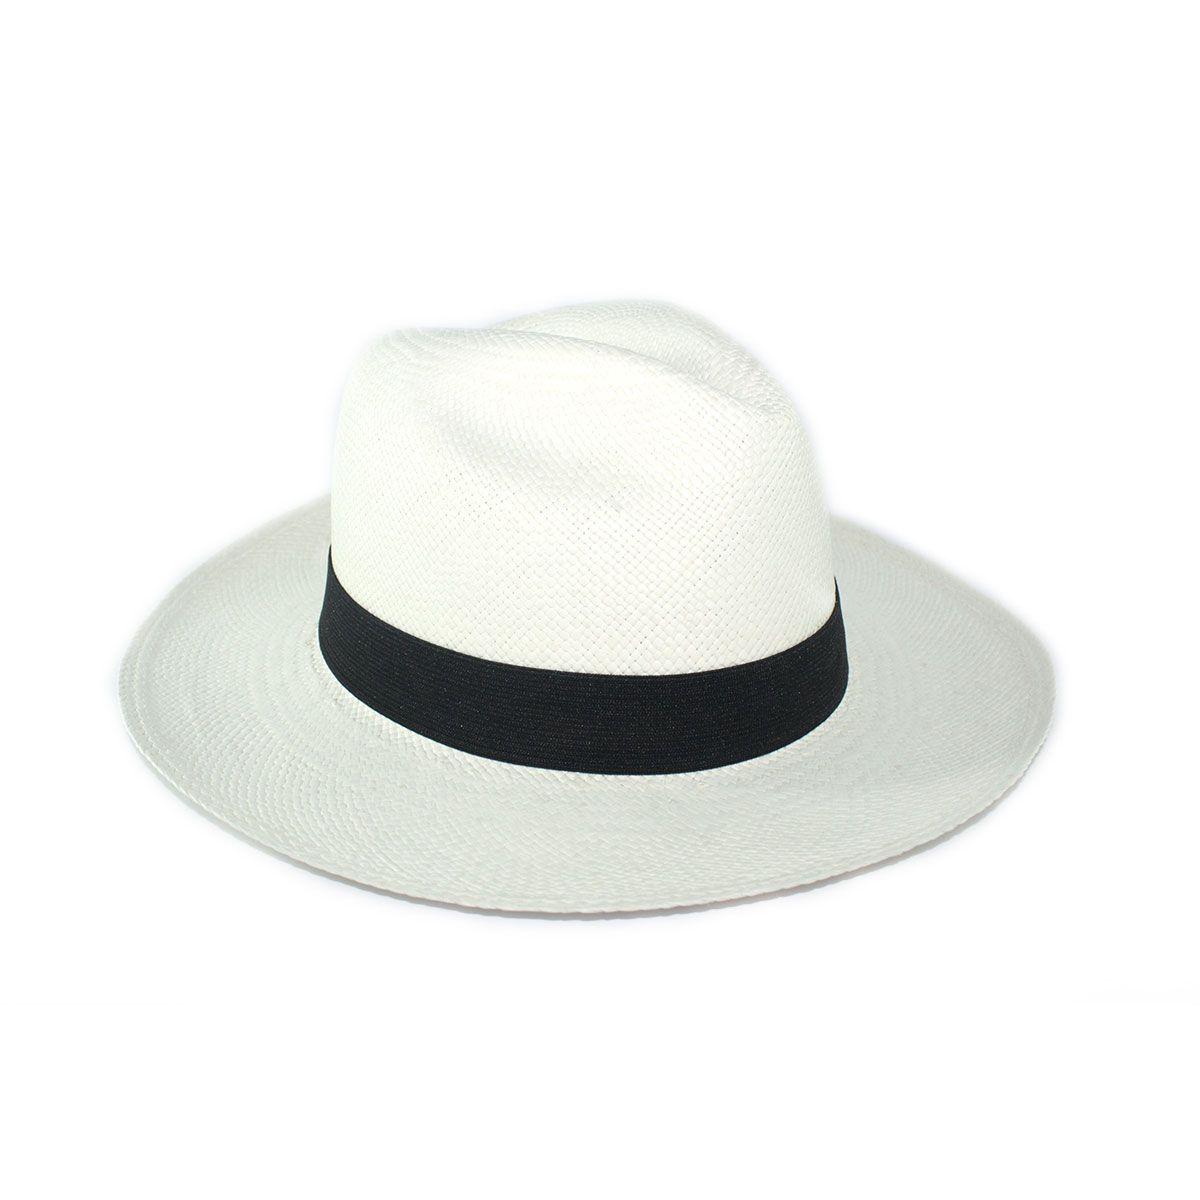 Chapéu Panamá Original (palha Toquilla)